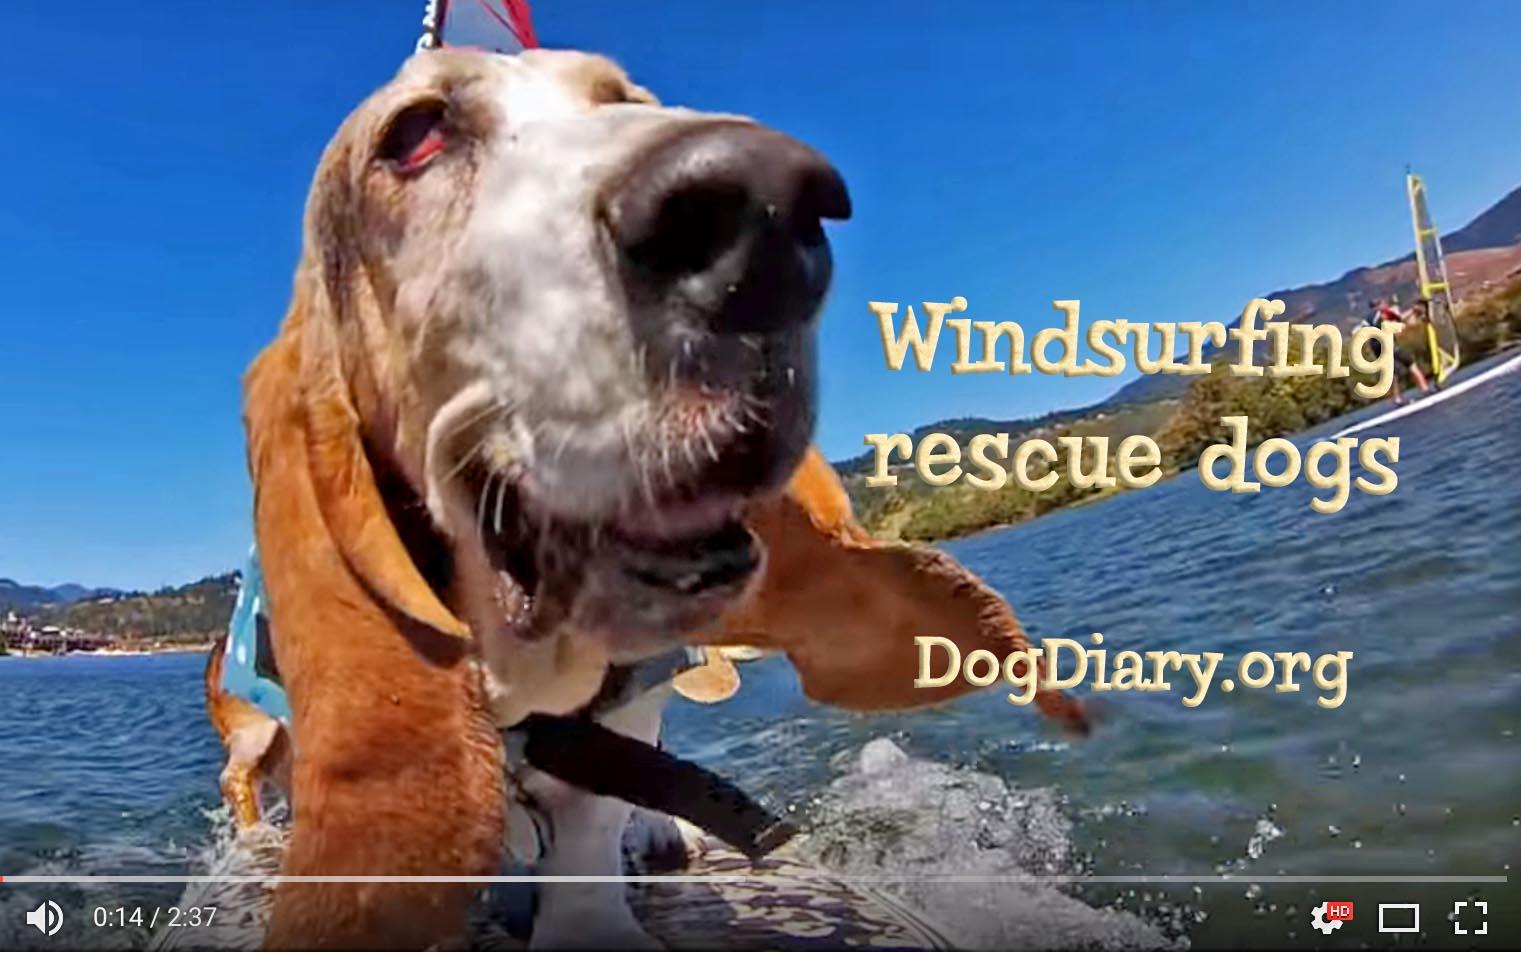 Winsurfing rescue dogs- shadow type_edited-1.jpg